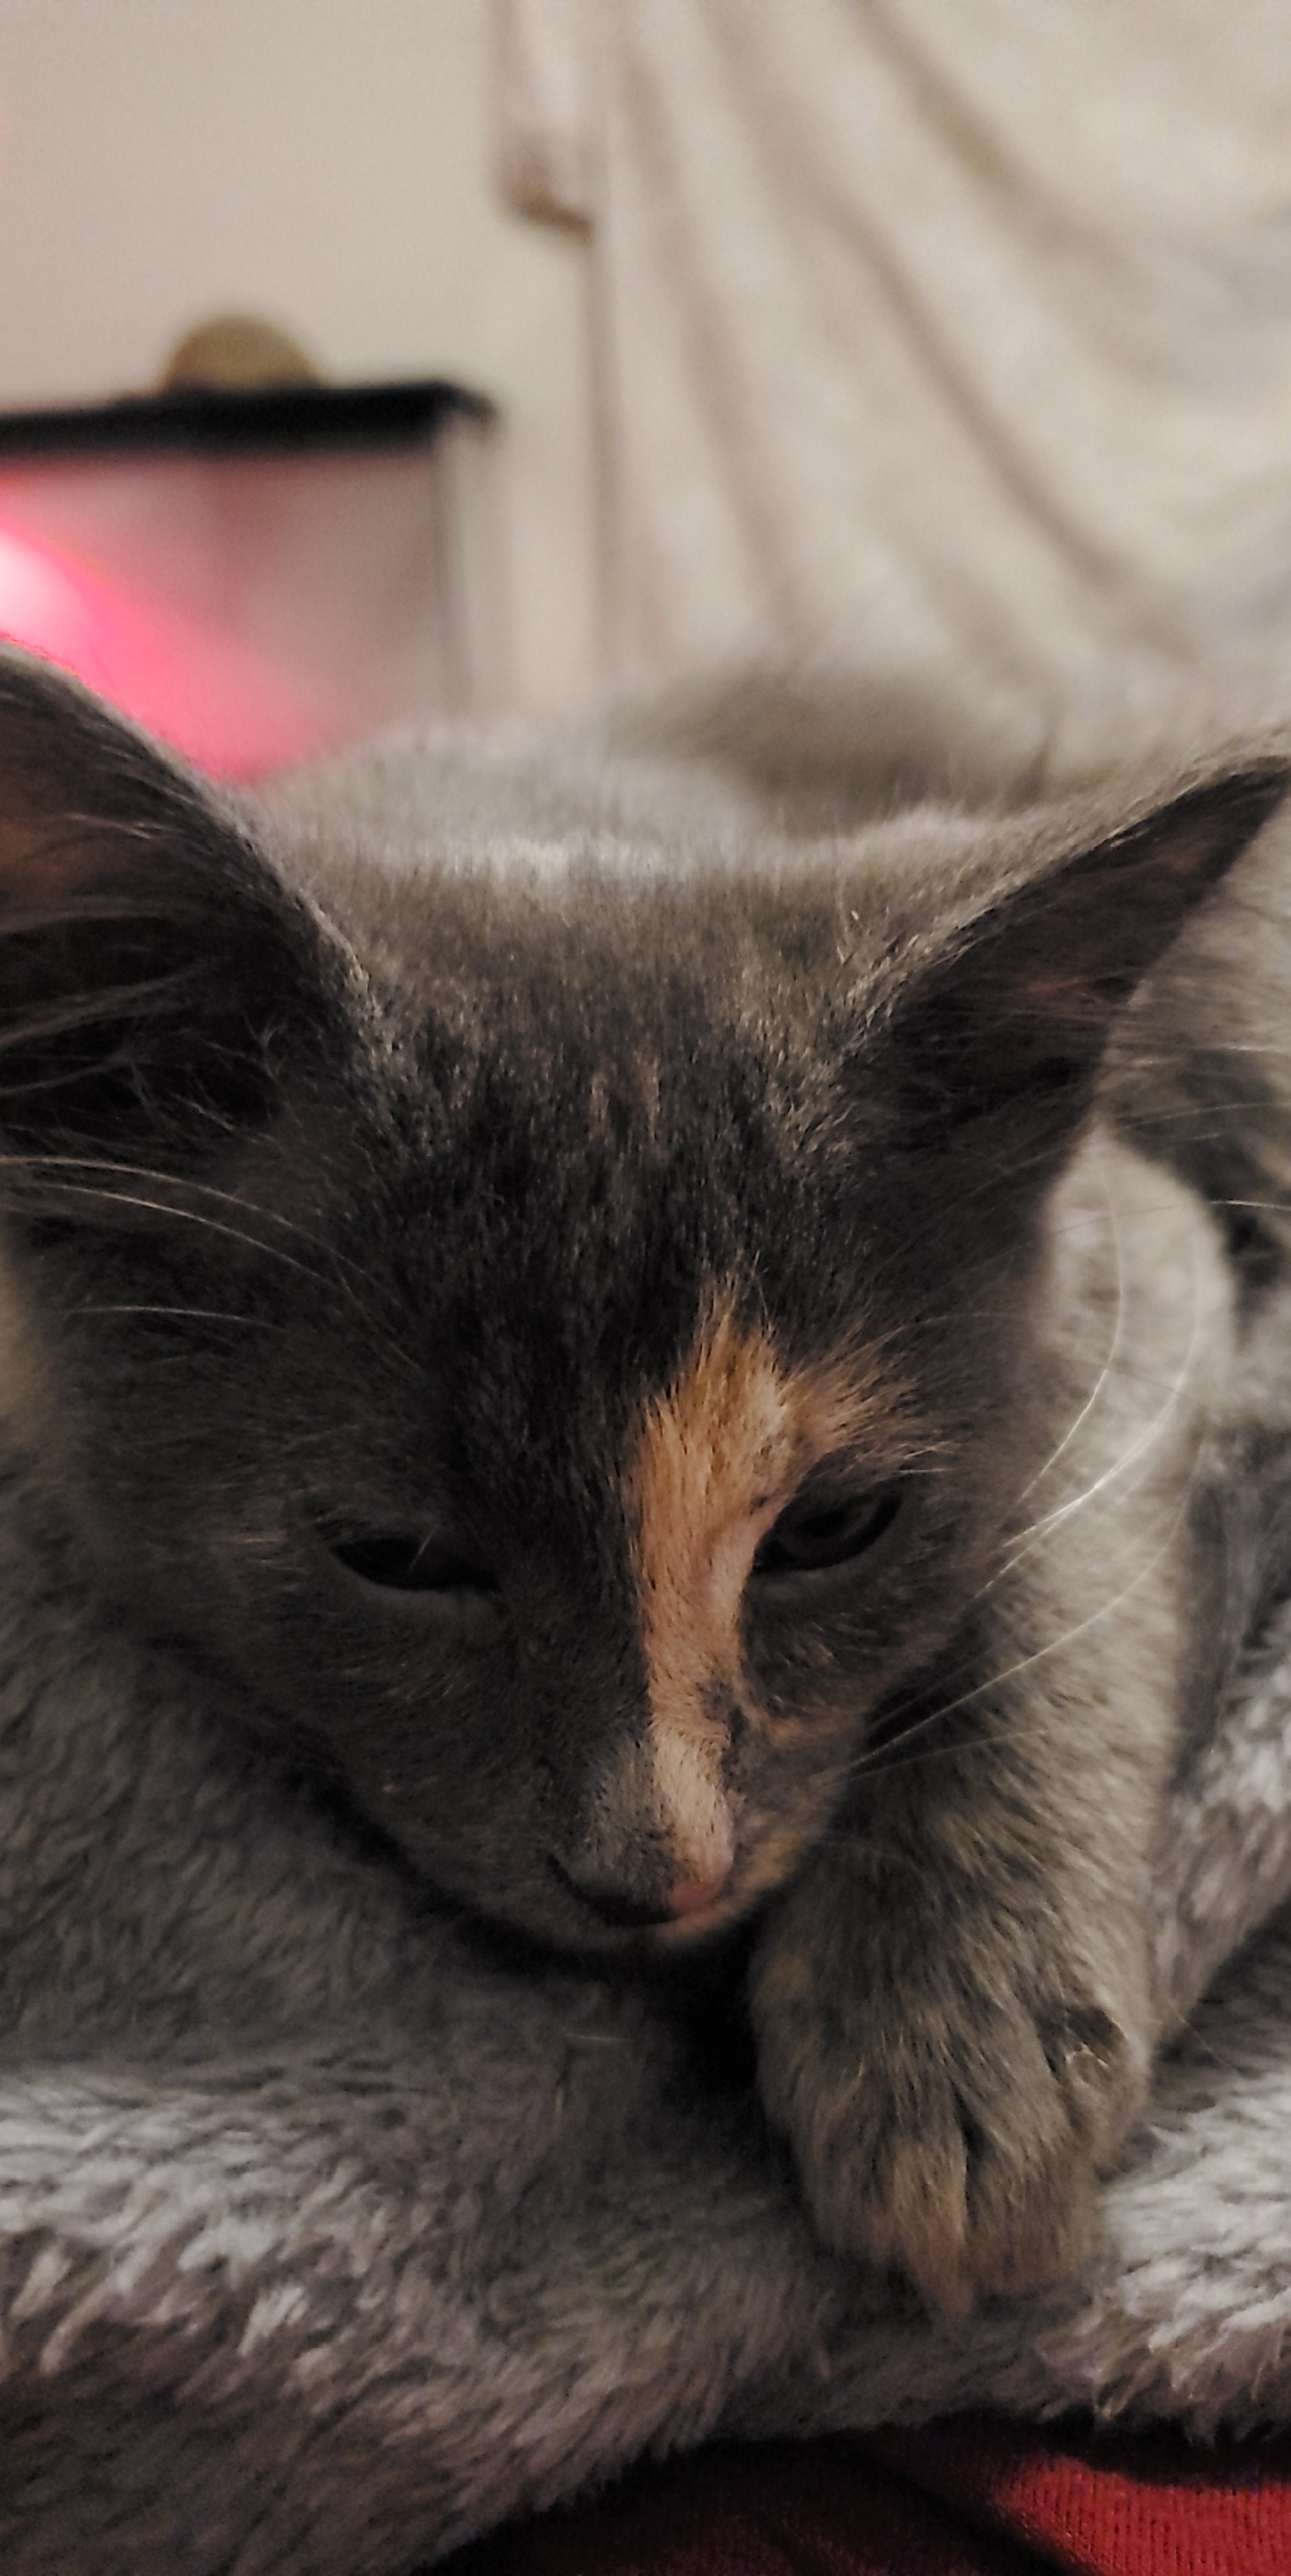 adoptable Cat in Laurel,MT named Amara